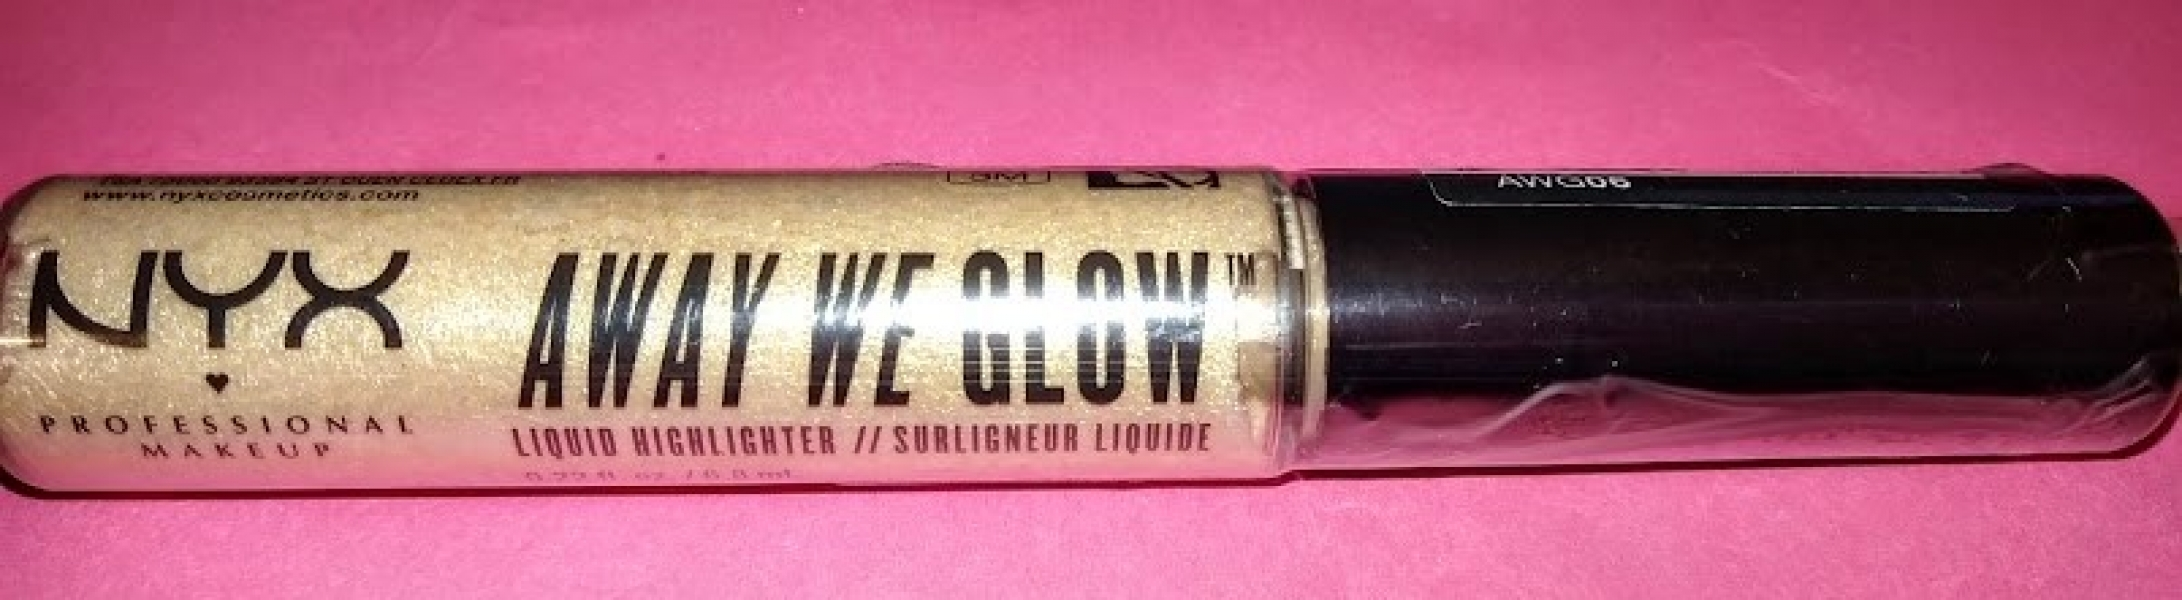 Swatch Away We Glow - Illuminateur de Teint Liquide, NYX